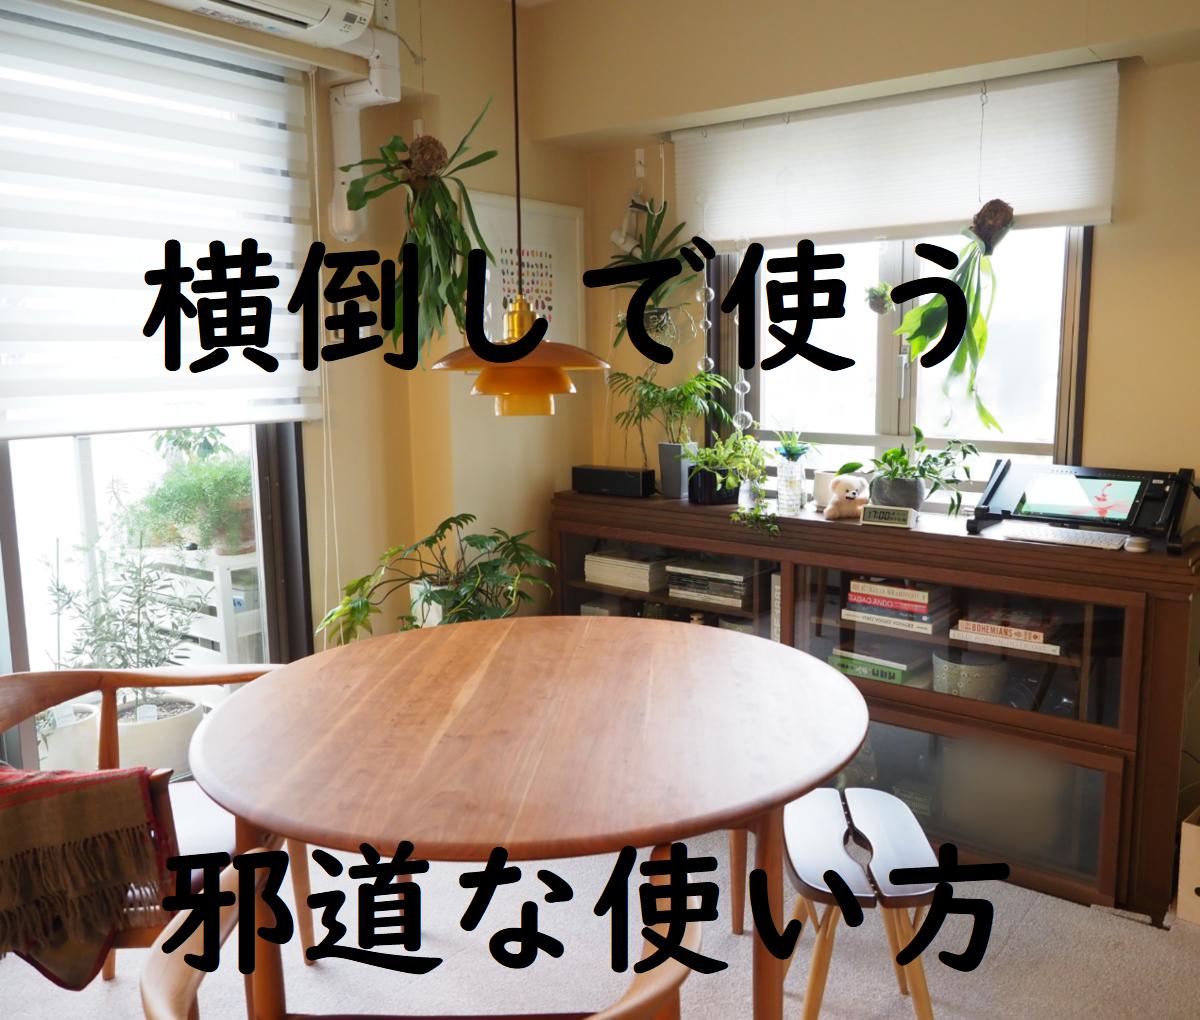 f:id:shokubutsuzoku:20200114111140p:plain